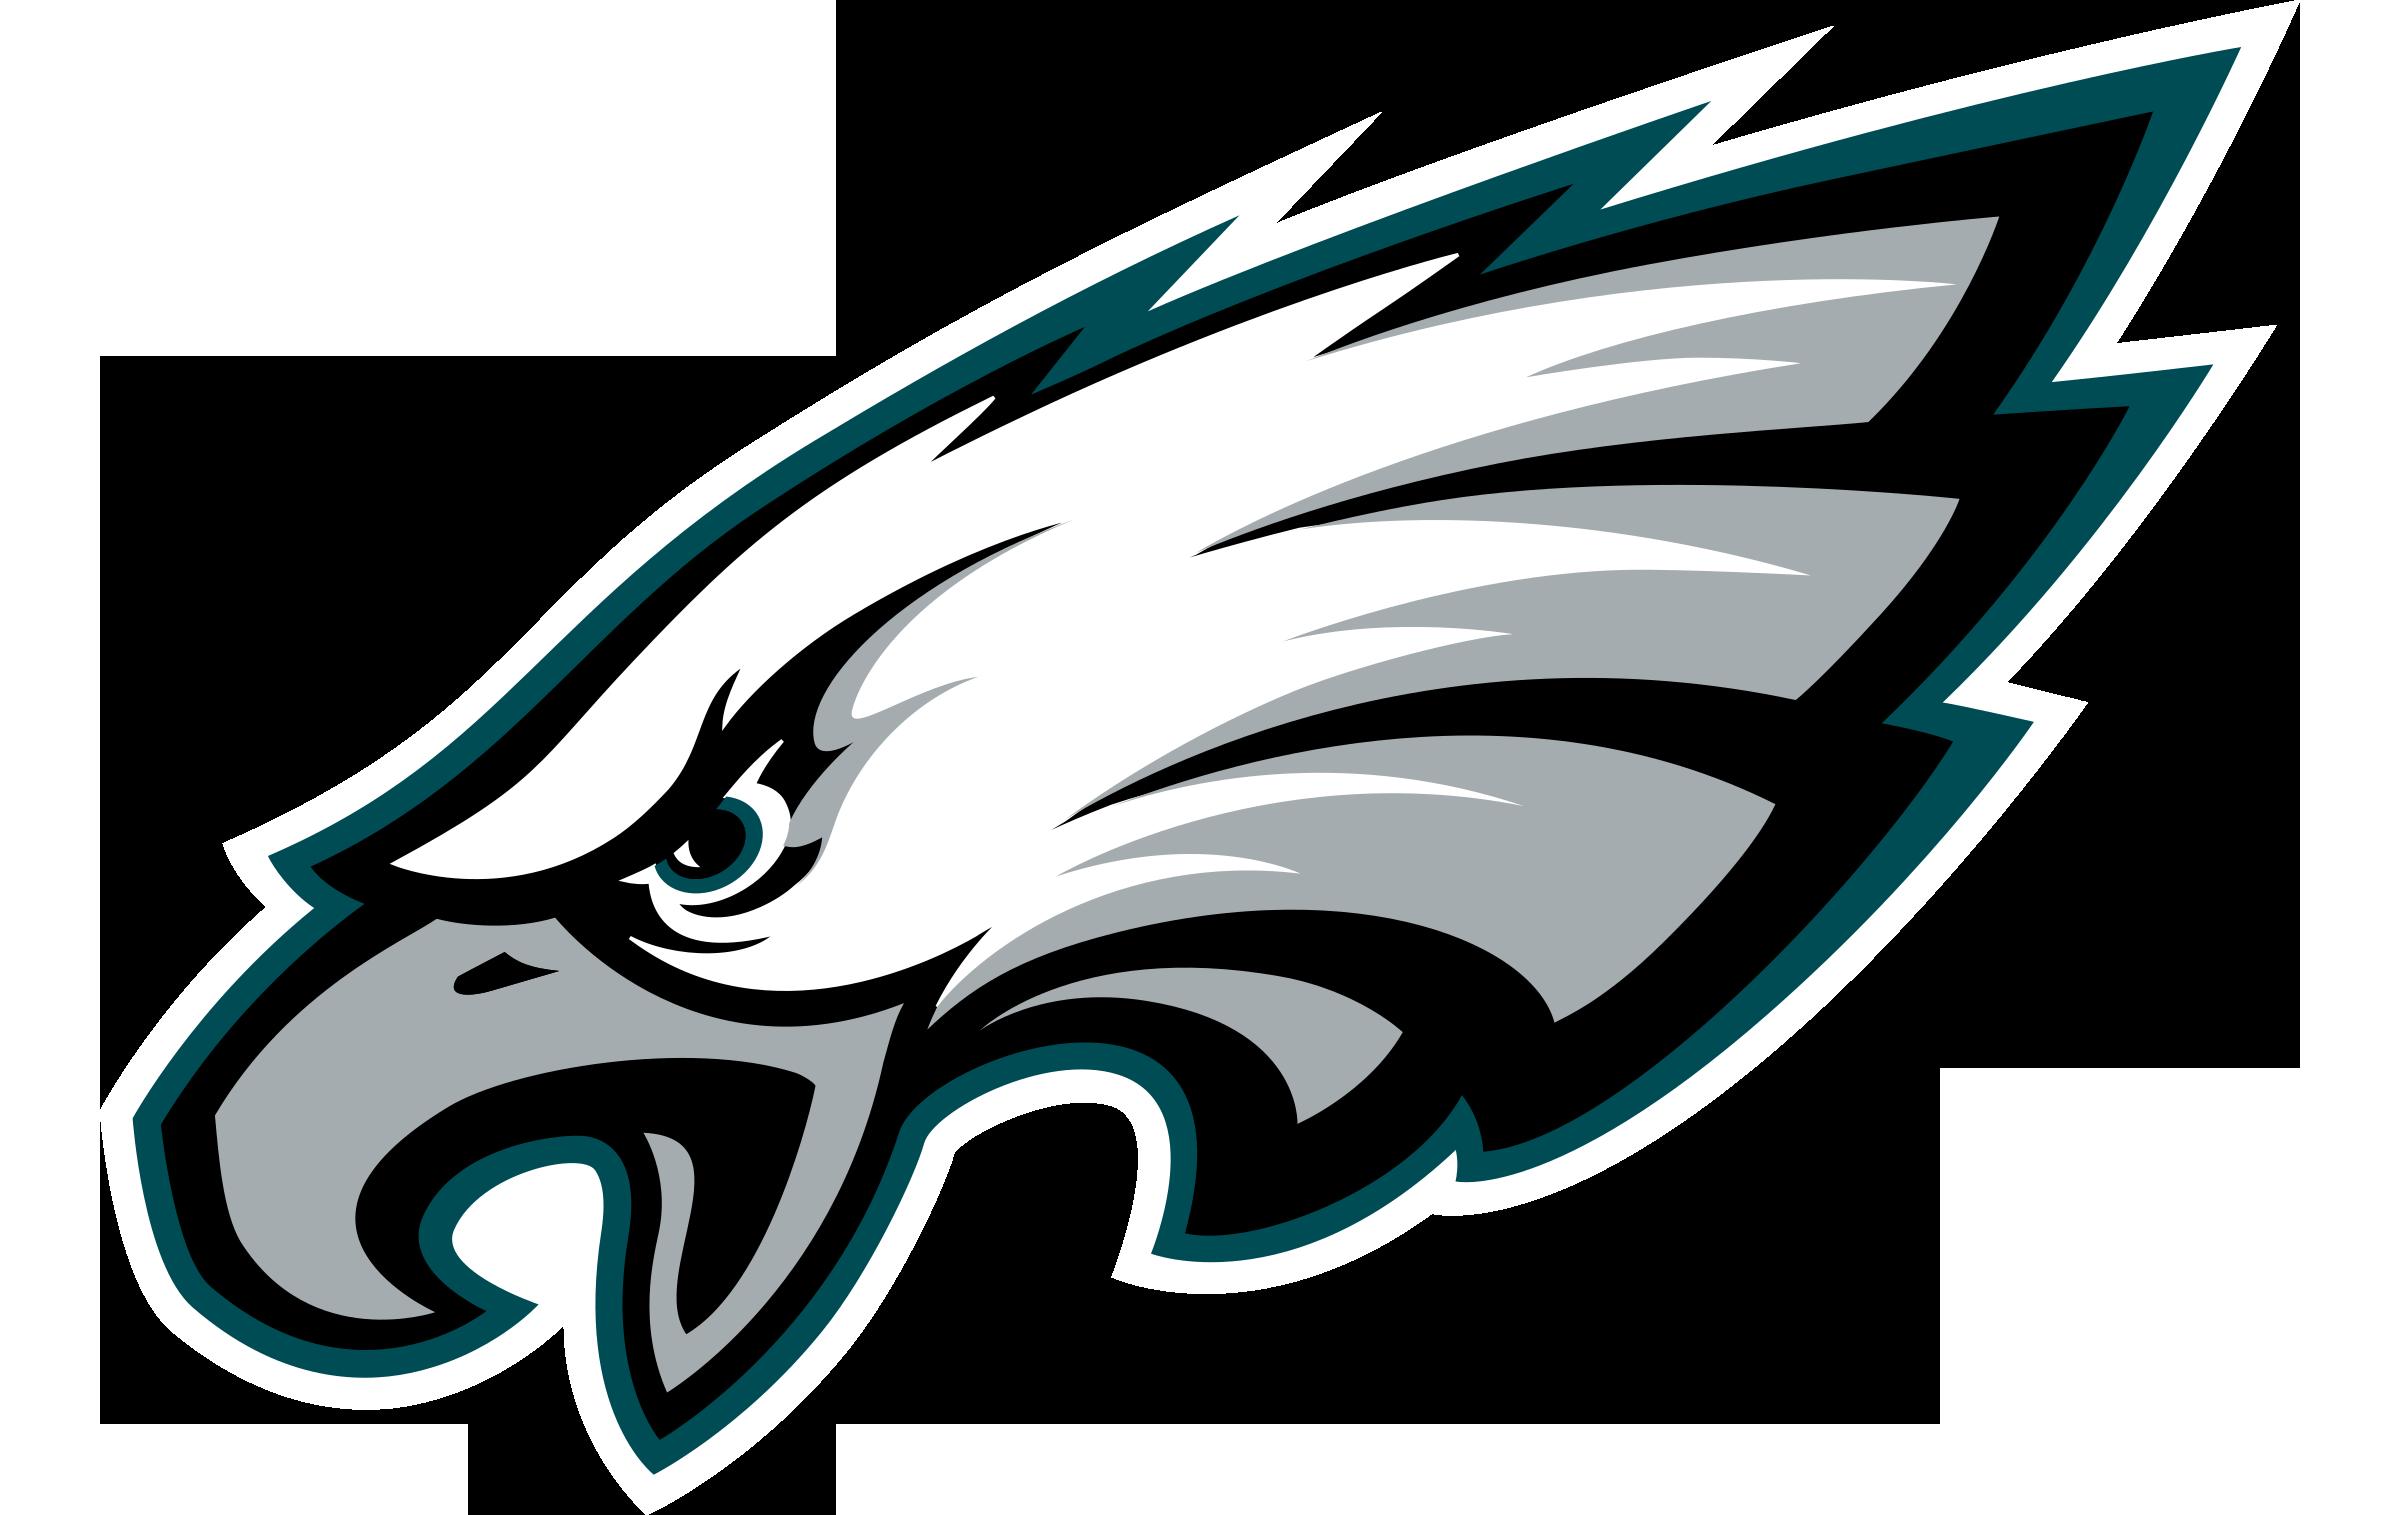 image library stock Clip philadelphia. Eagles logo png transparent